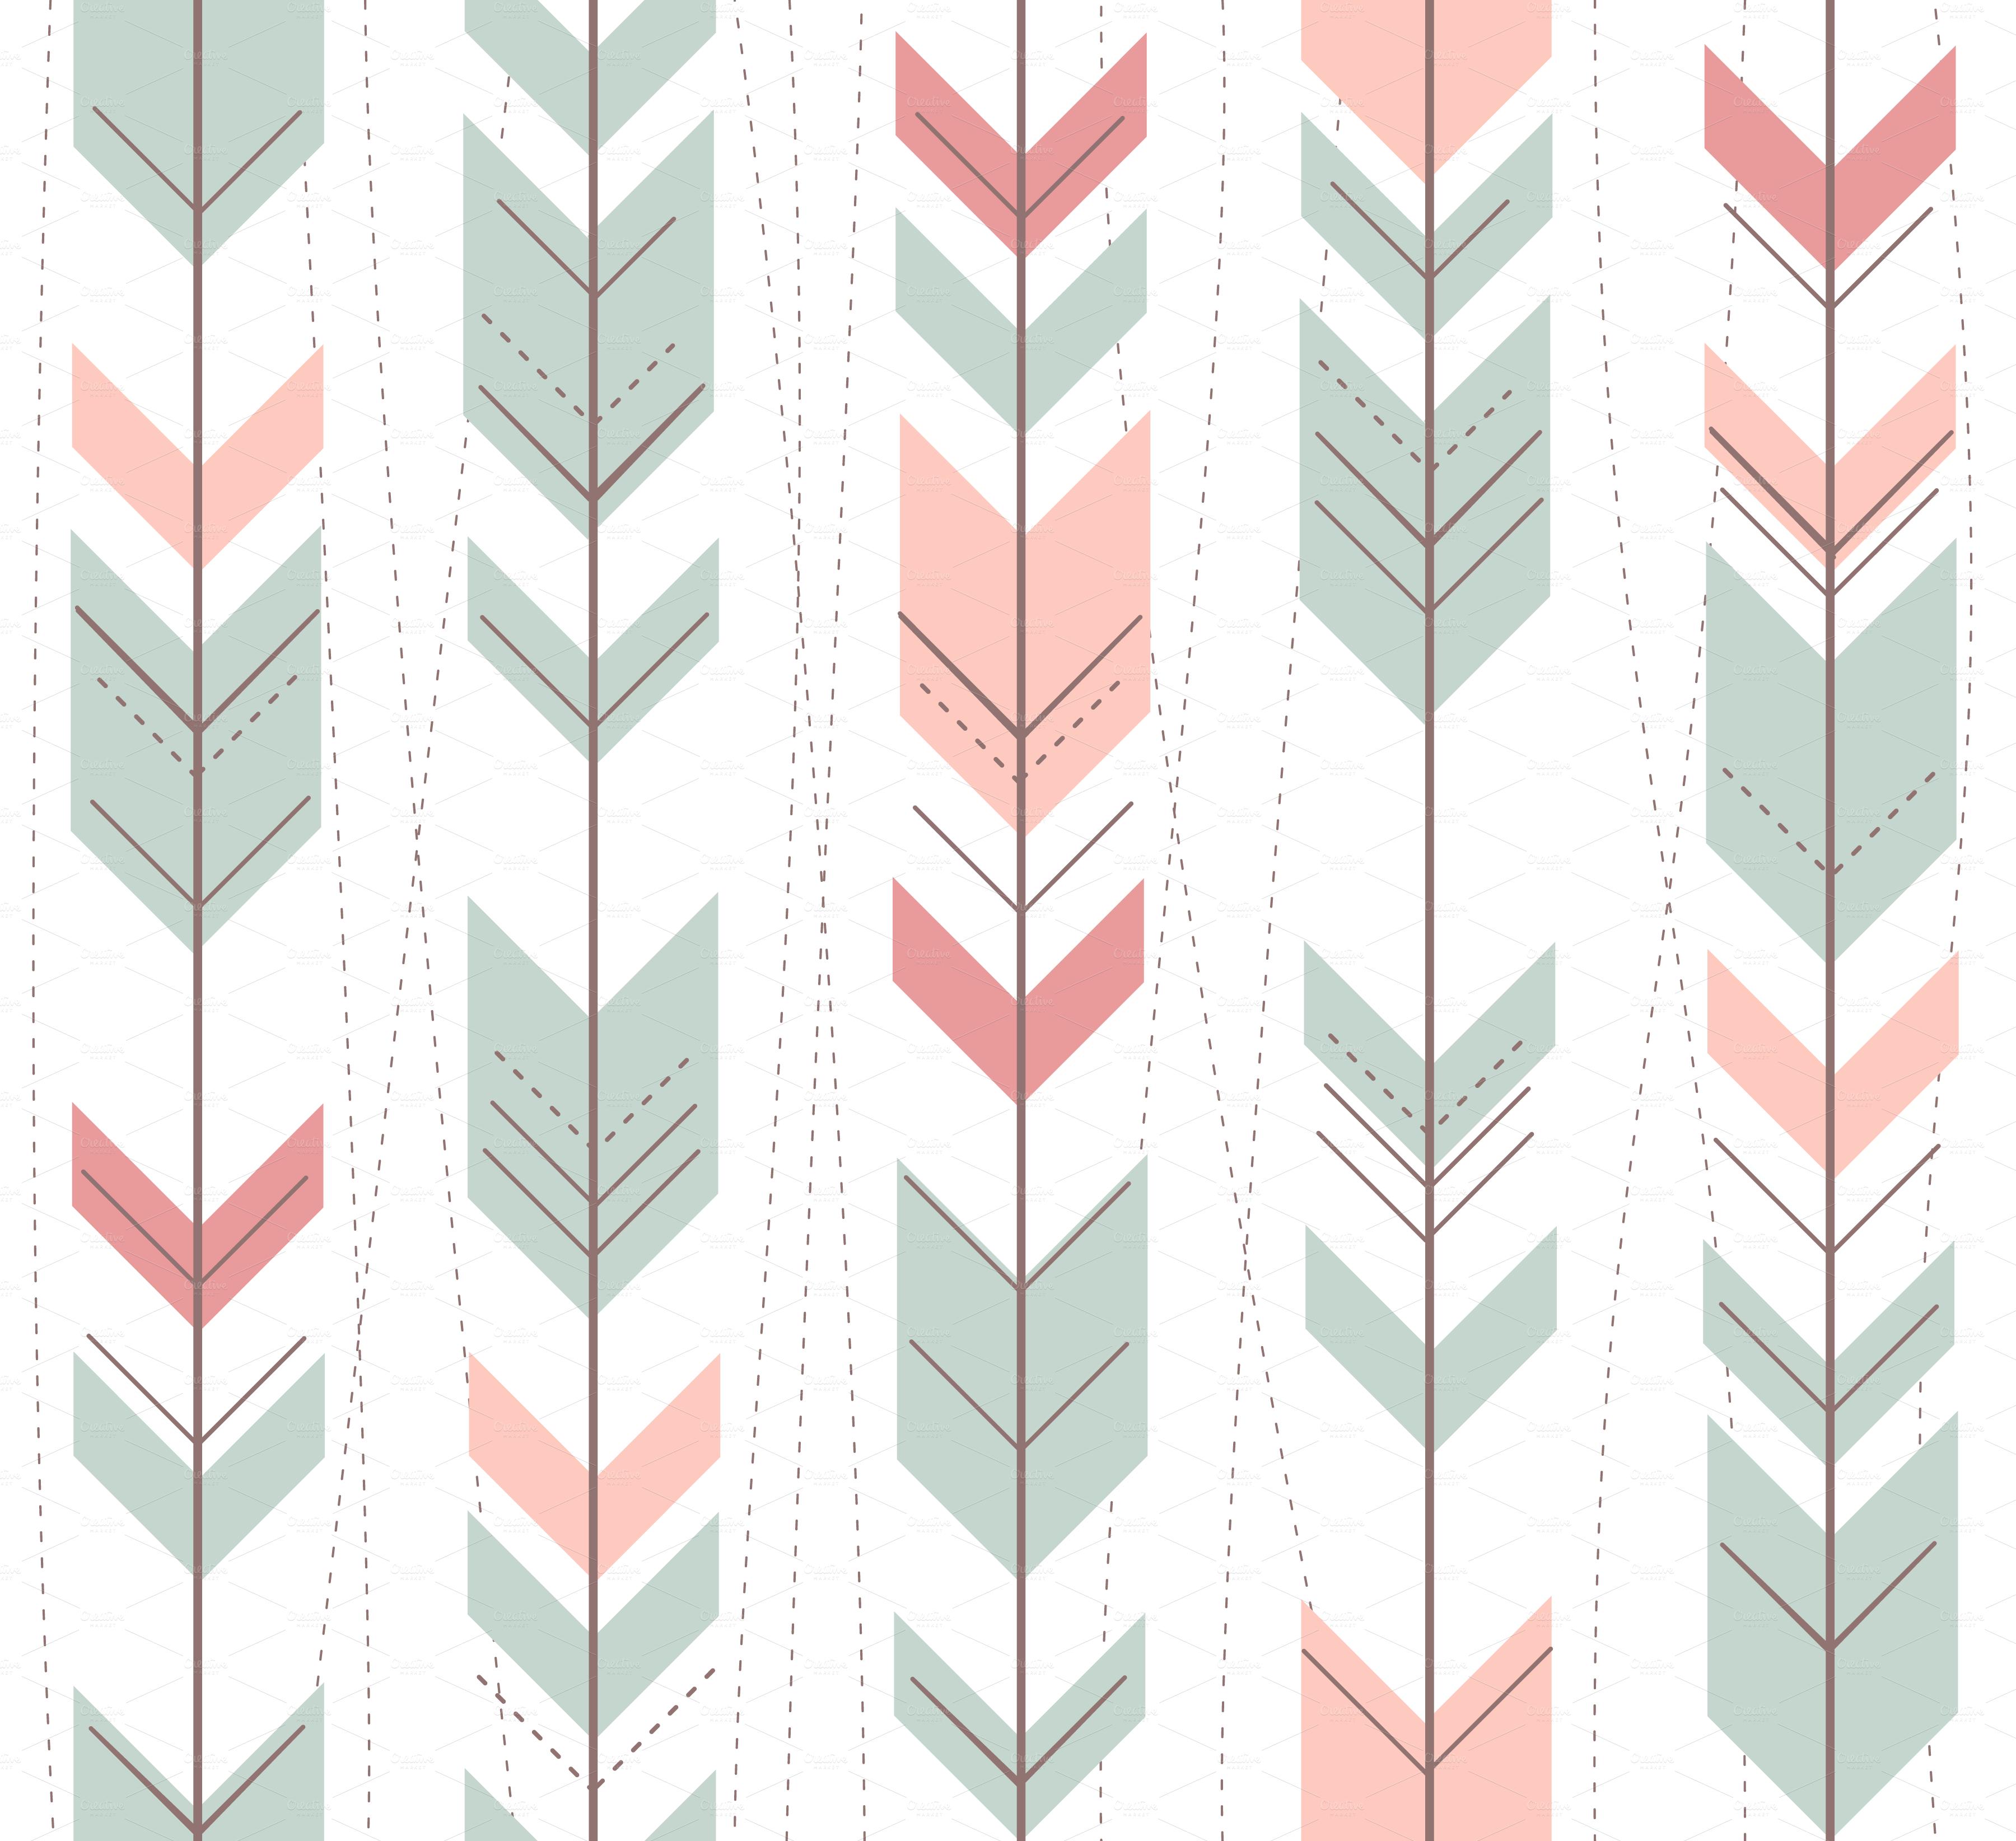 Iphone wallpaper tumblr boho - Background Tumblr Boho Cerca Con Google